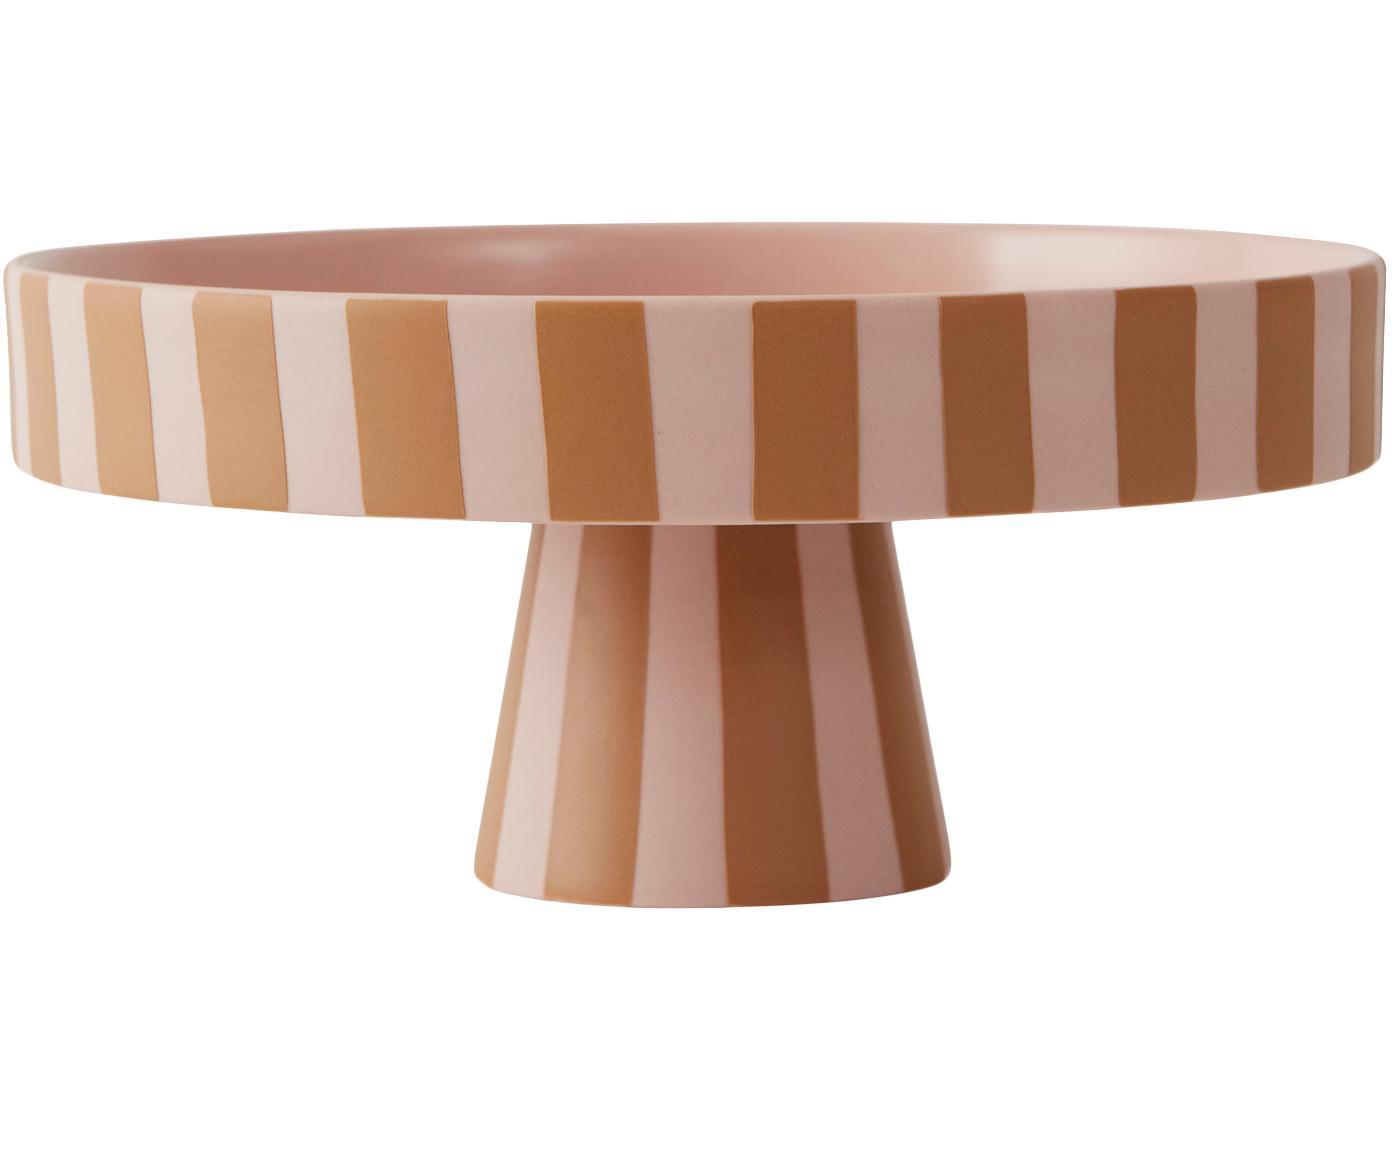 Kleine Tortenplatte Toppu, Keramik, Karamellbraun, Rosa, Ø 20 x H 9 cm